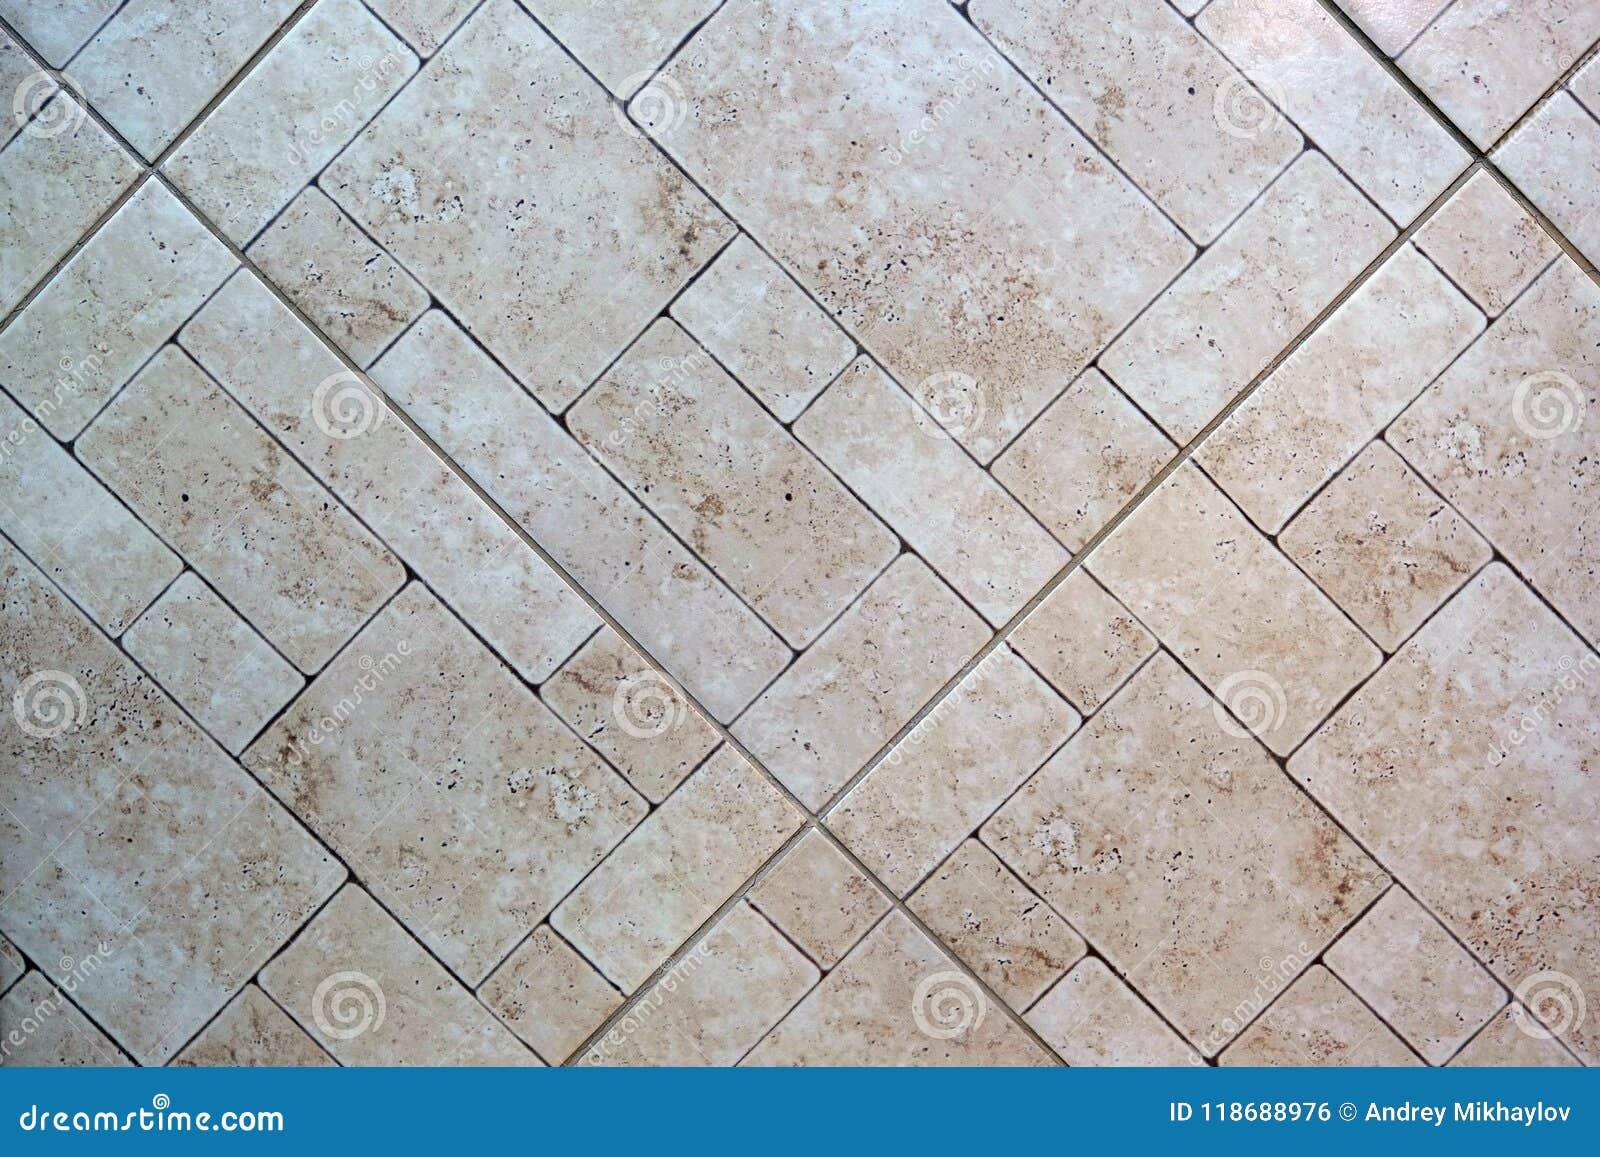 Ceramic Tile Dark Square Seamless Texture Gray Tile Flooring Stock